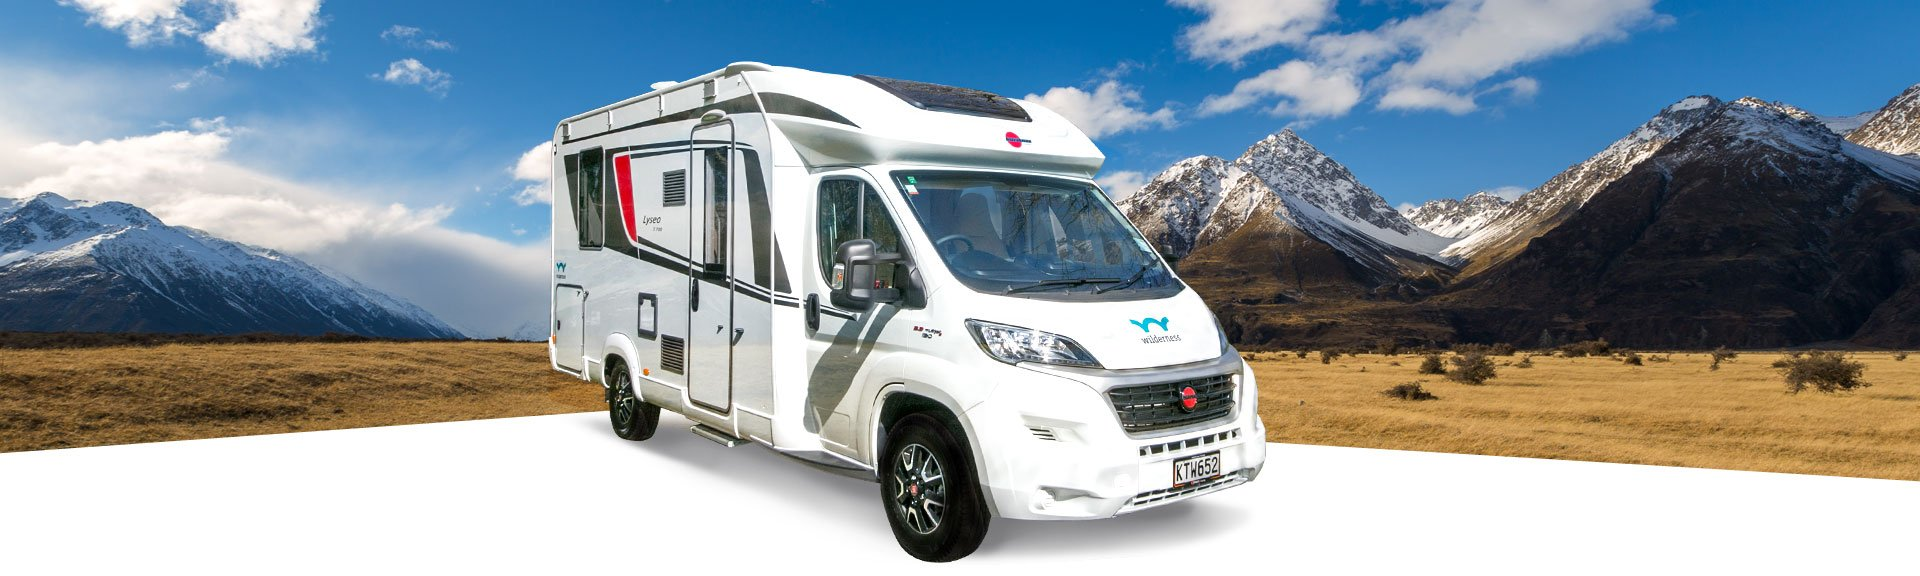 Campervans New Zealand Faqs Wilderness Way Circuit Breaker Panel Rv World